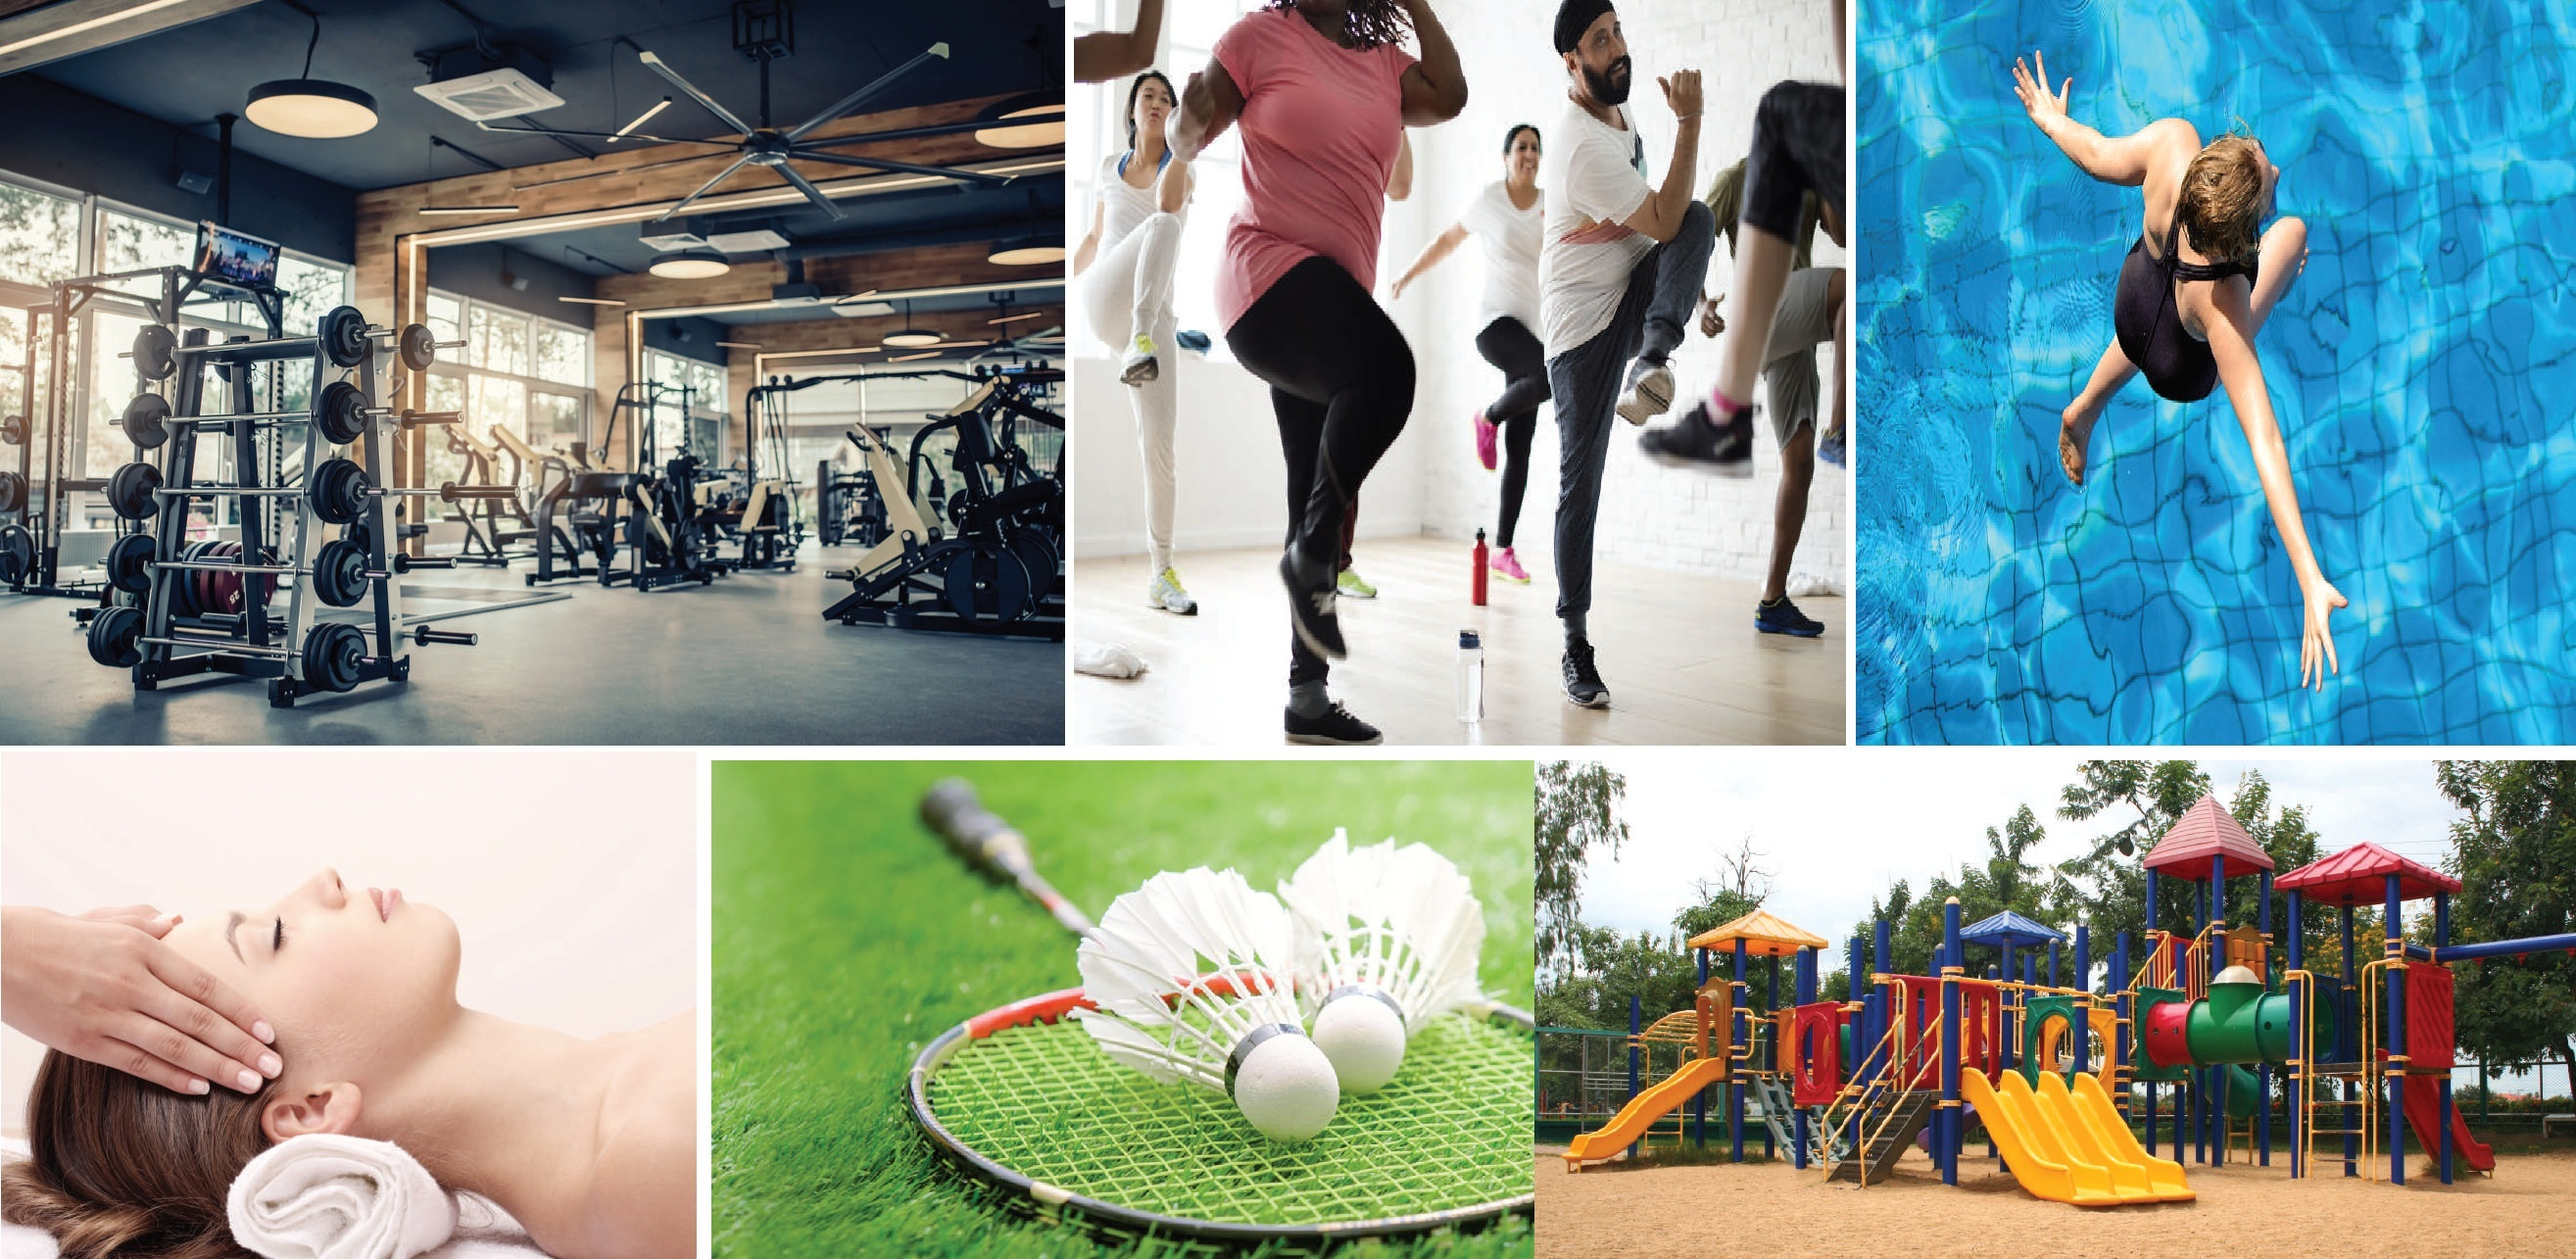 juhi niharika absolute amenities features9